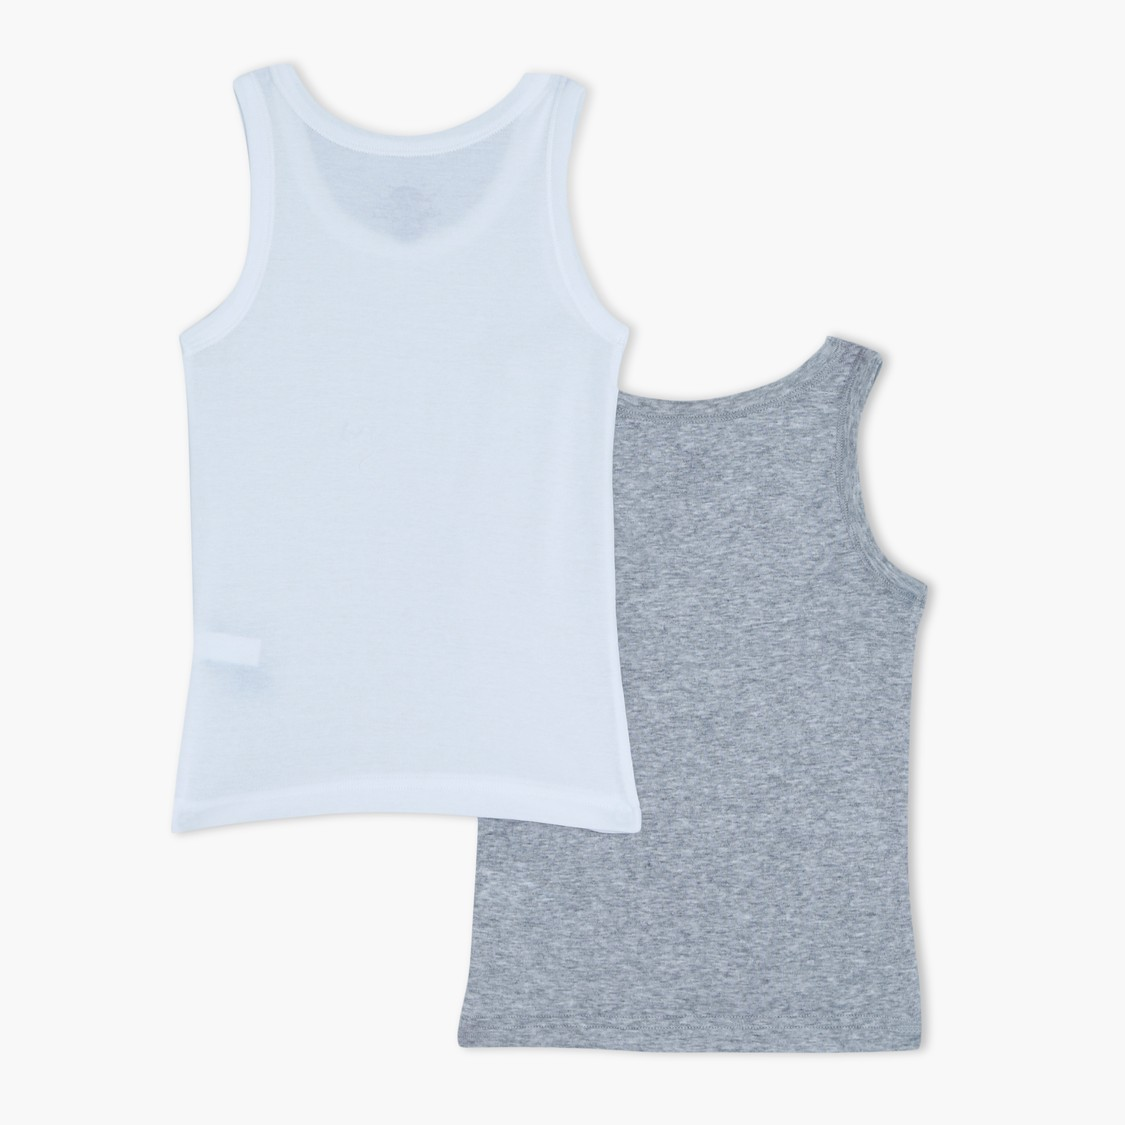 Sleeveless Vest - Set of 2